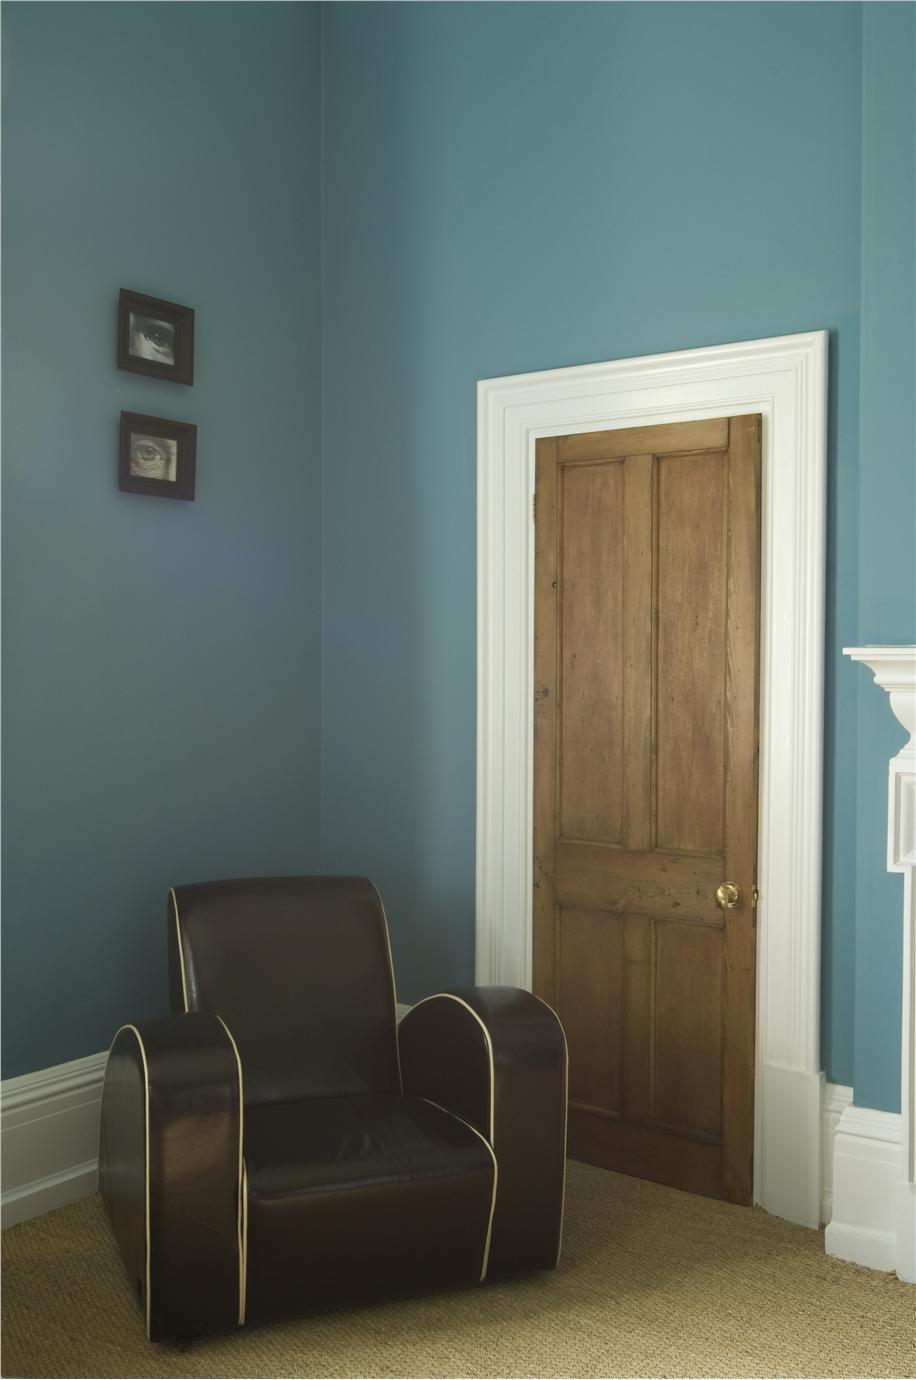 farrow ball stone blue 86 eparket. Black Bedroom Furniture Sets. Home Design Ideas